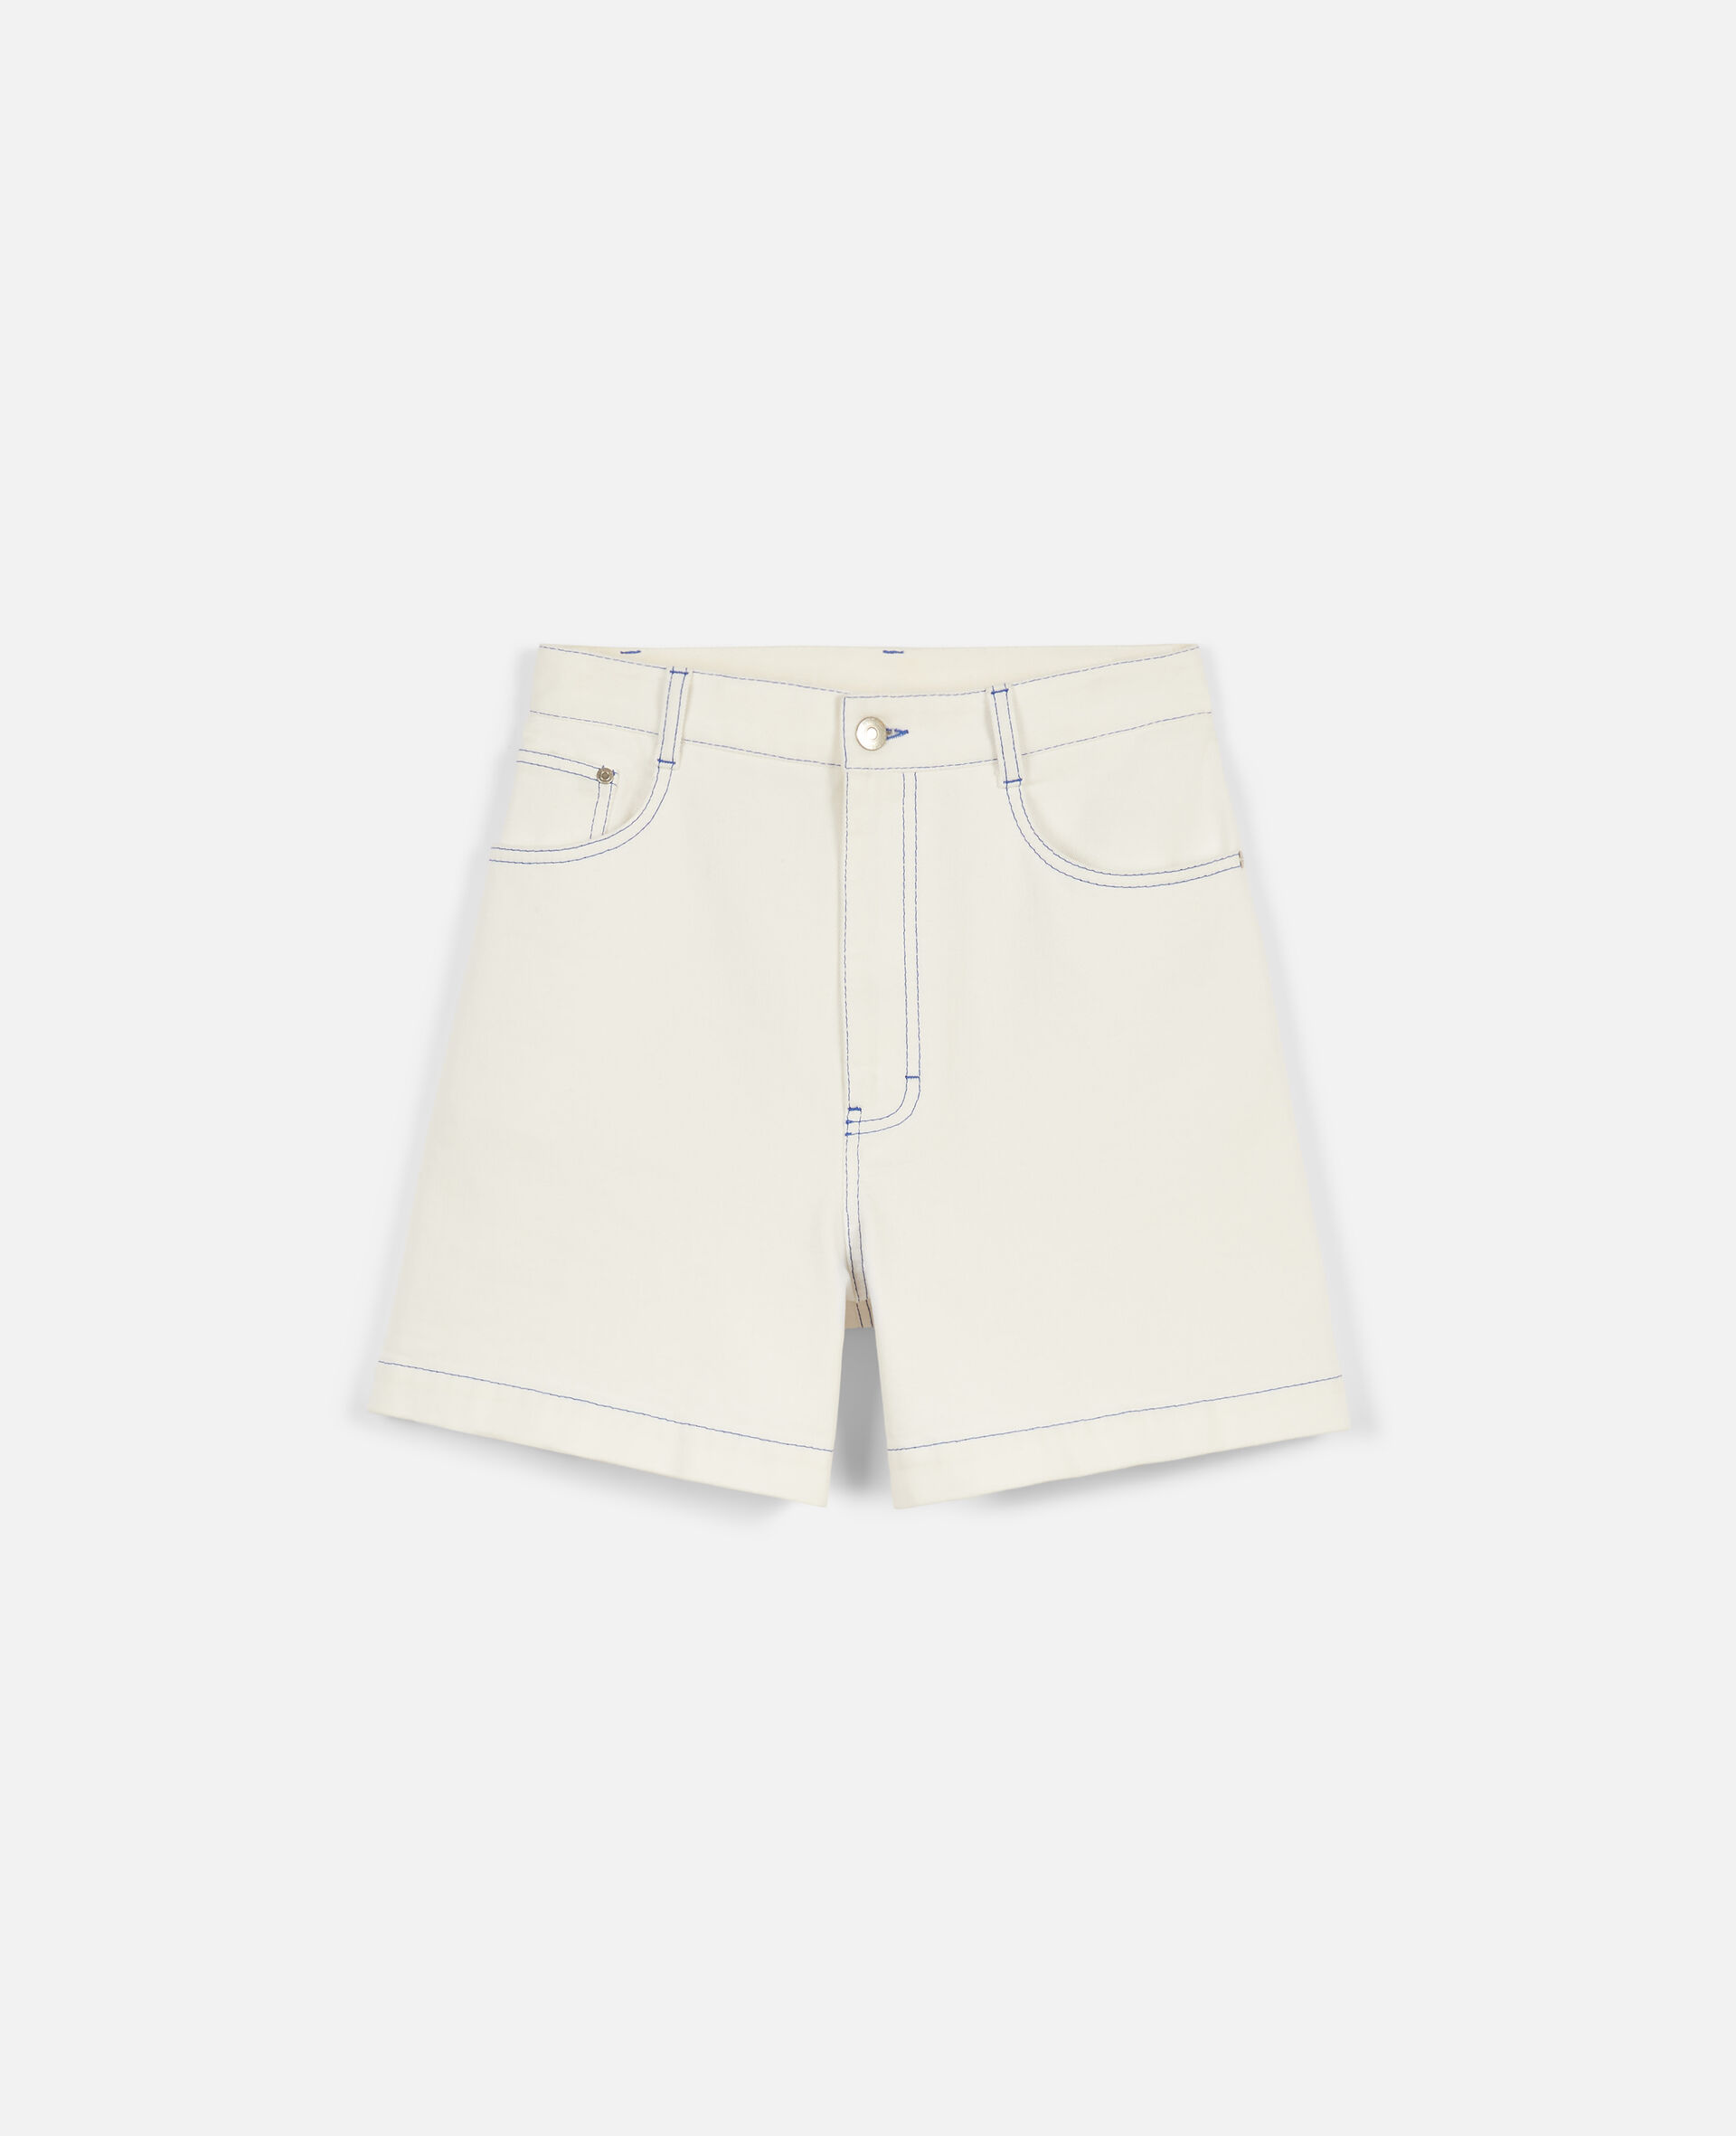 23 OBS Denim Shorts-White-large image number 0